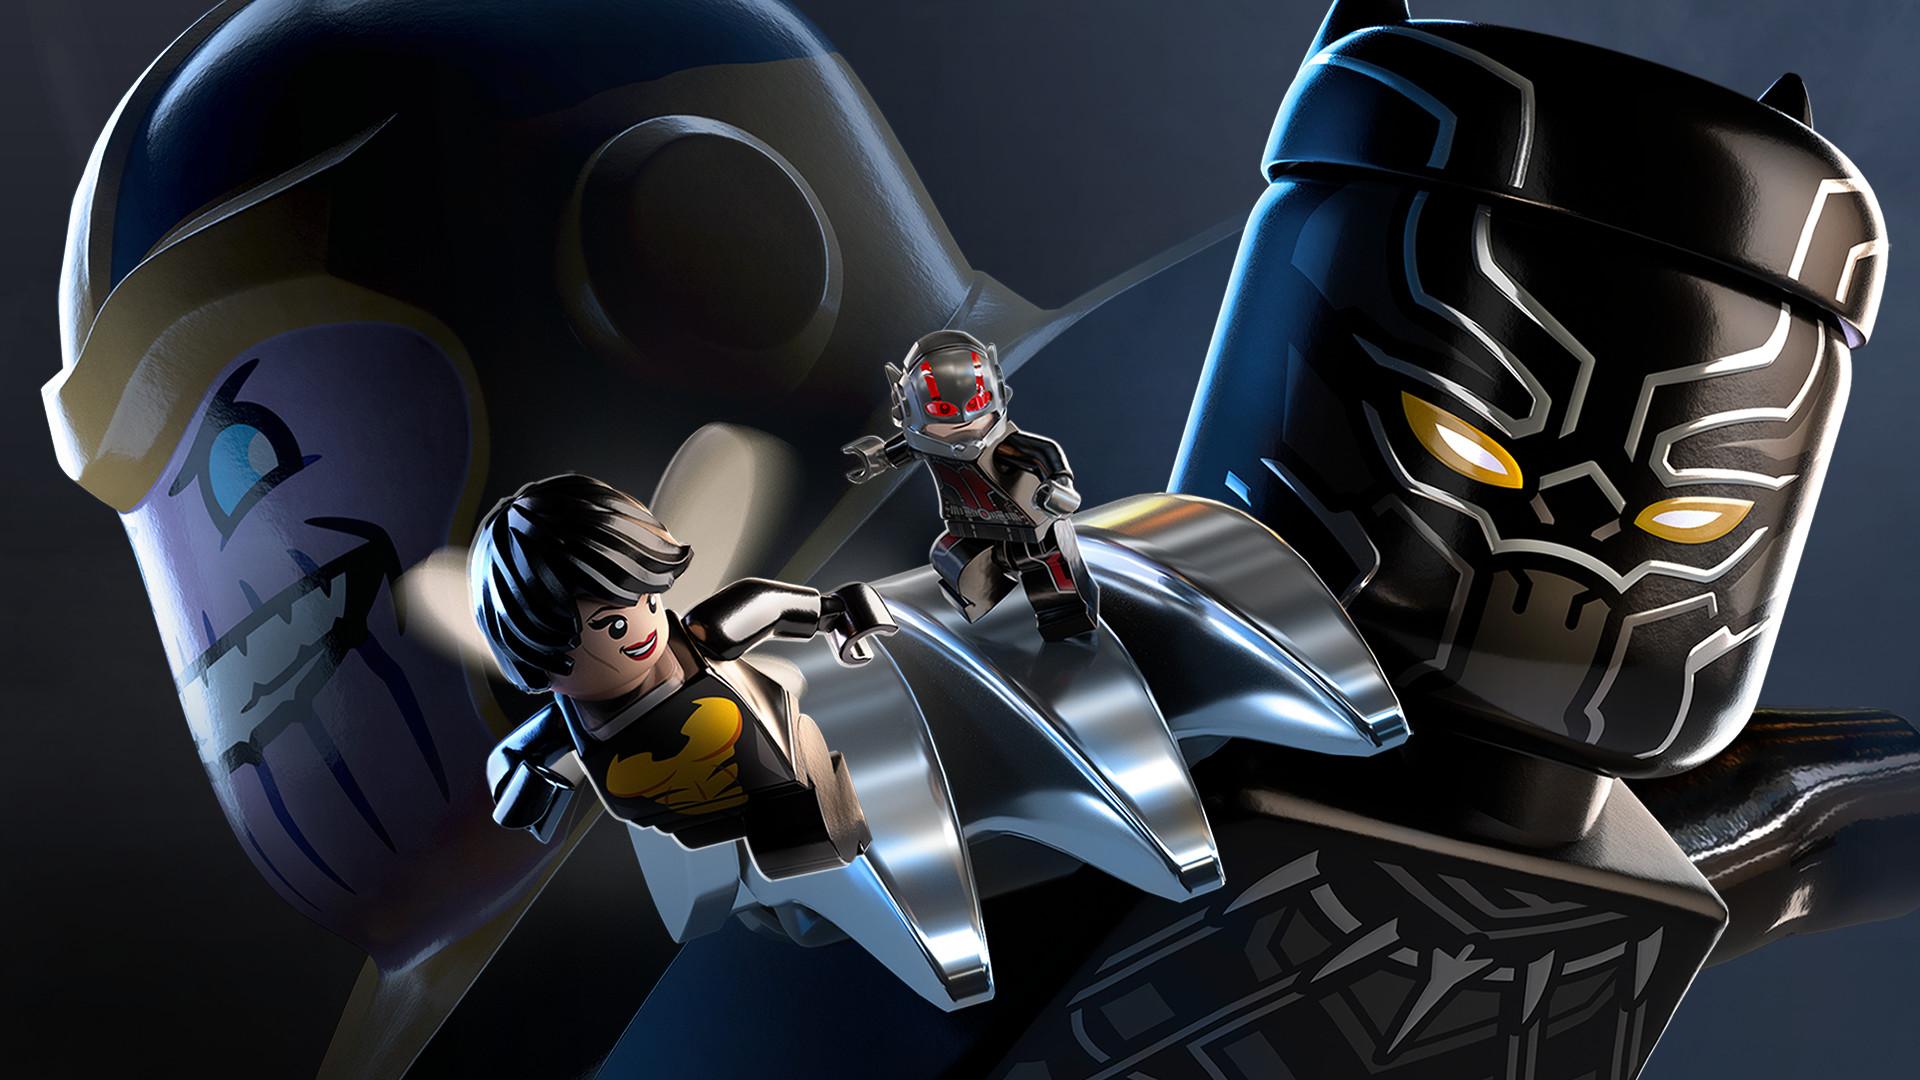 Image lego marvel superheroes 2 season pass 001g marvel lego marvel superheroes 2 season pass 001g voltagebd Gallery